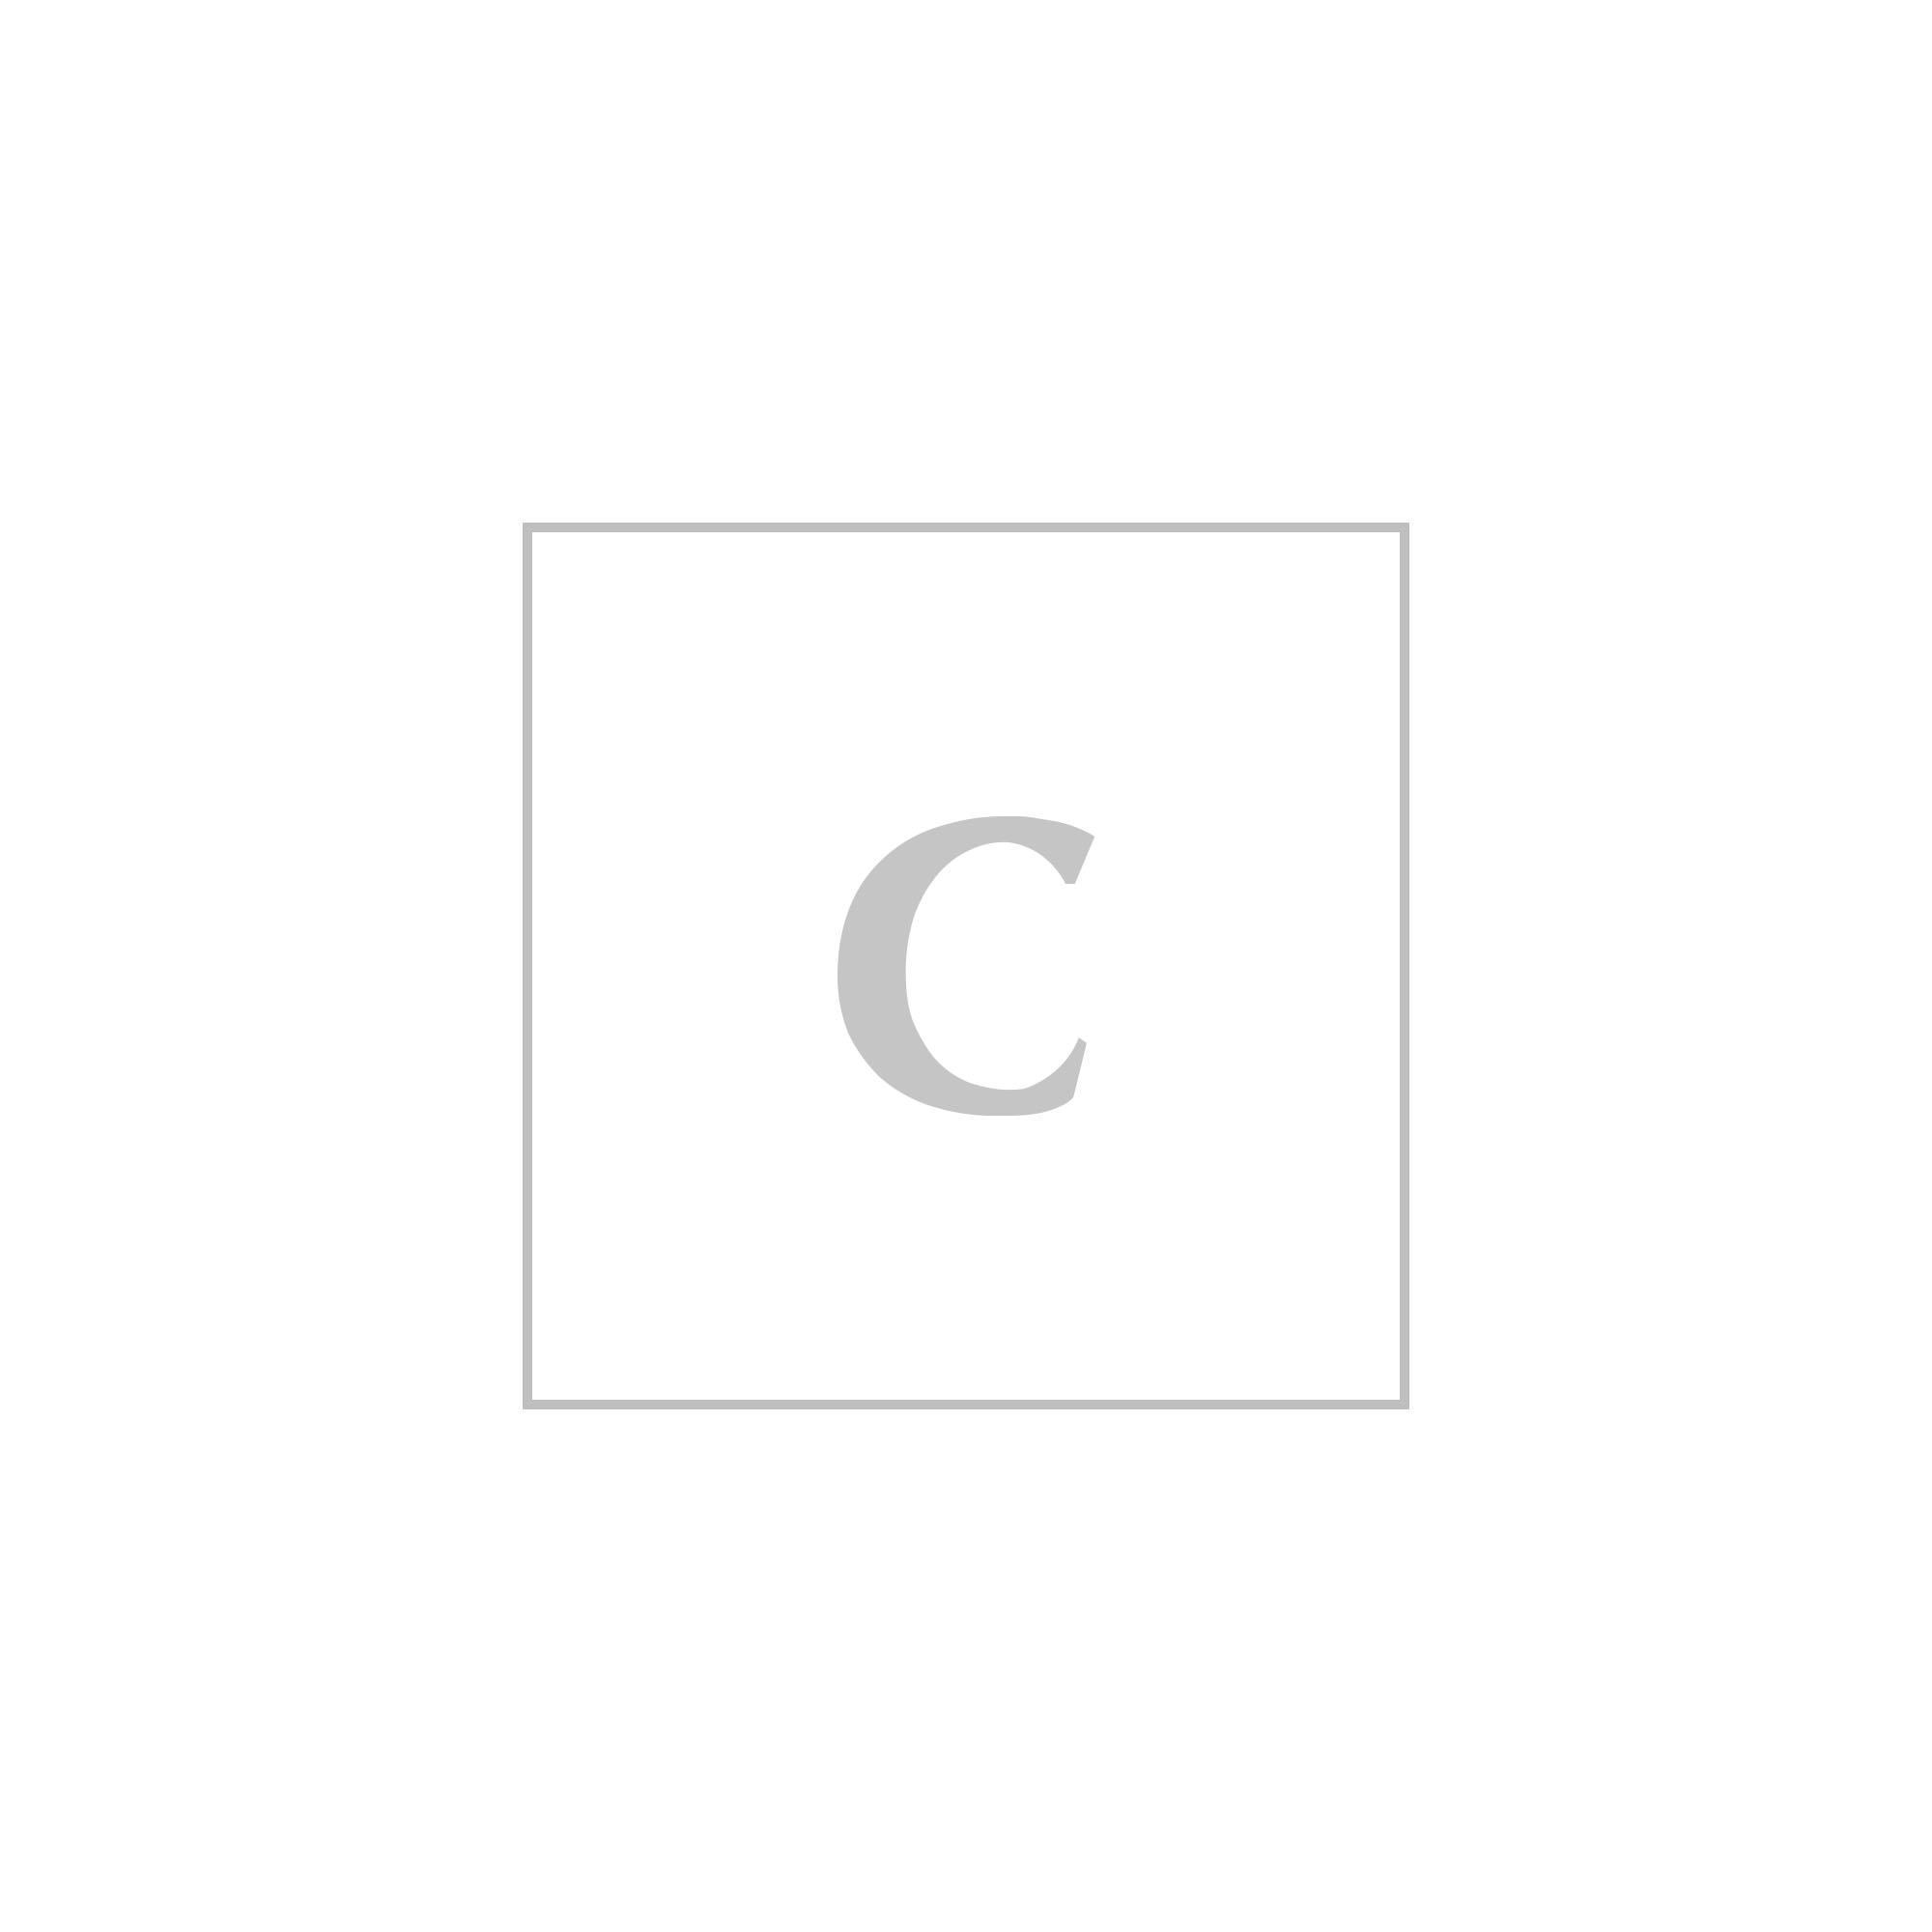 Christian Dior borsa lady dior tricolor cannage